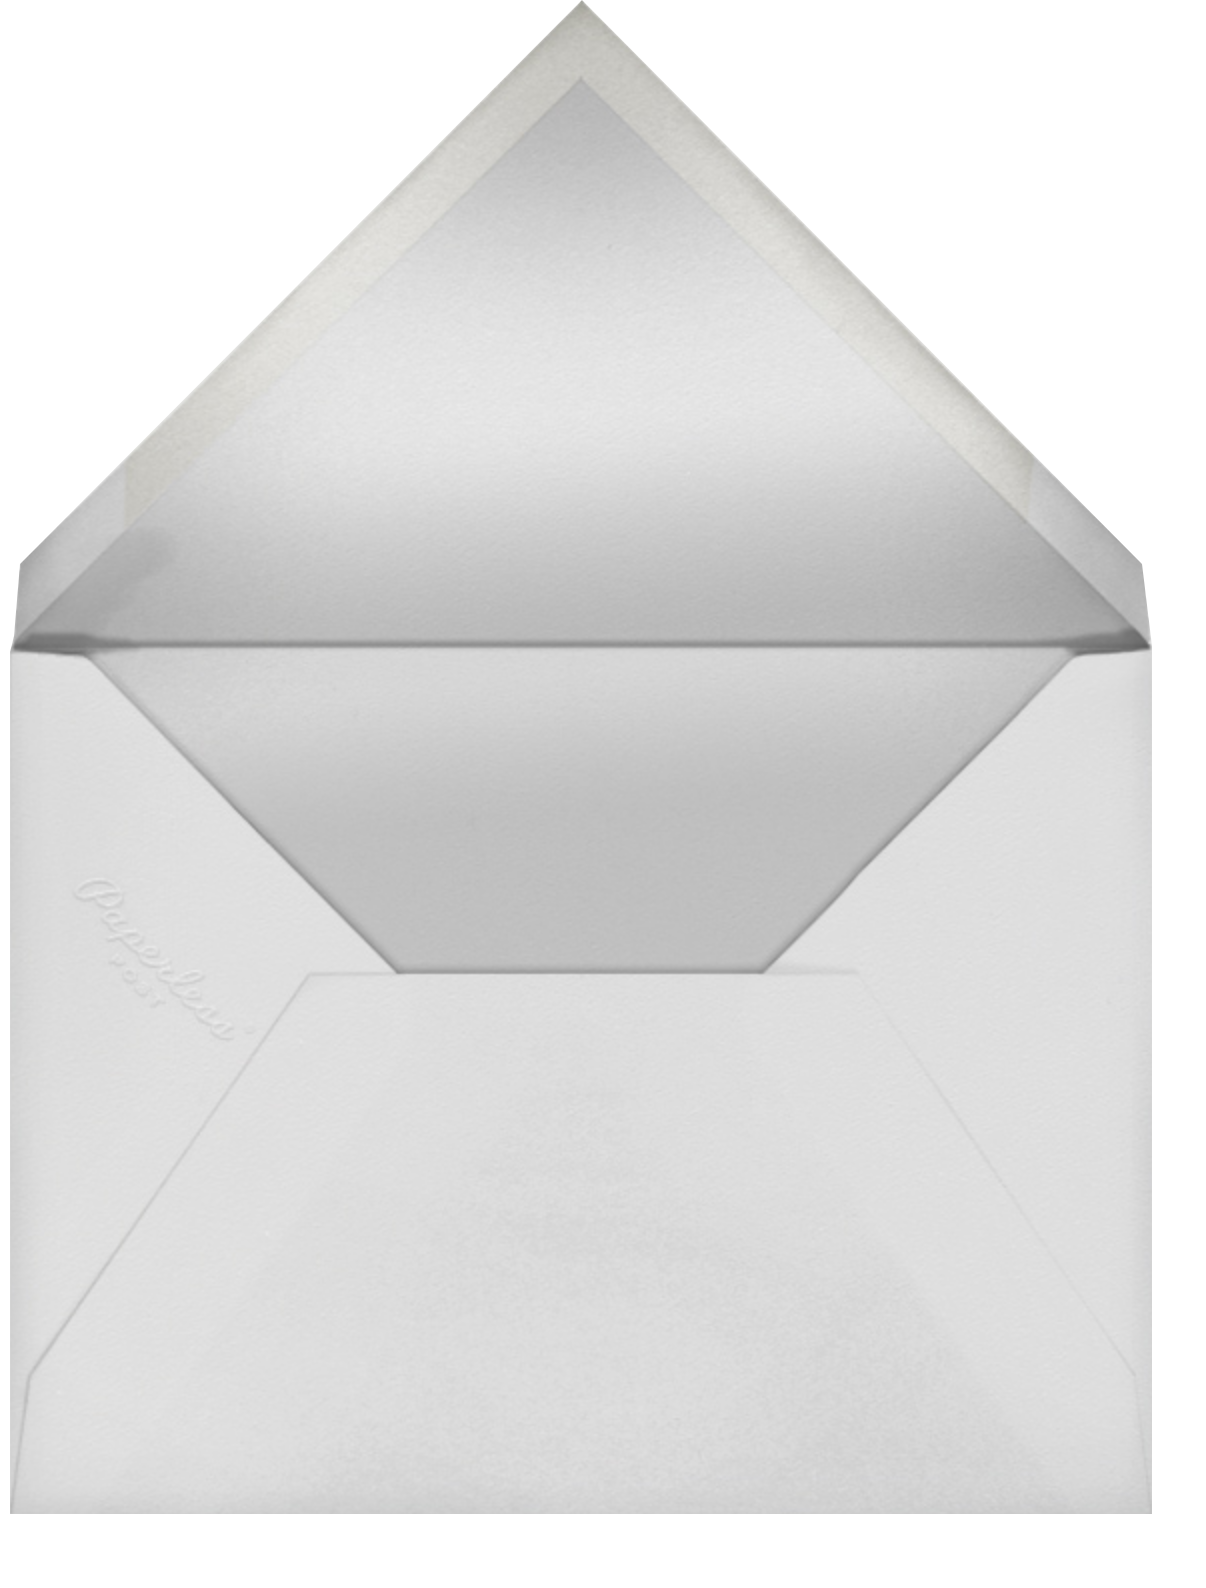 Chronology (Menu) - Wood - Paperless Post - Menus - envelope back